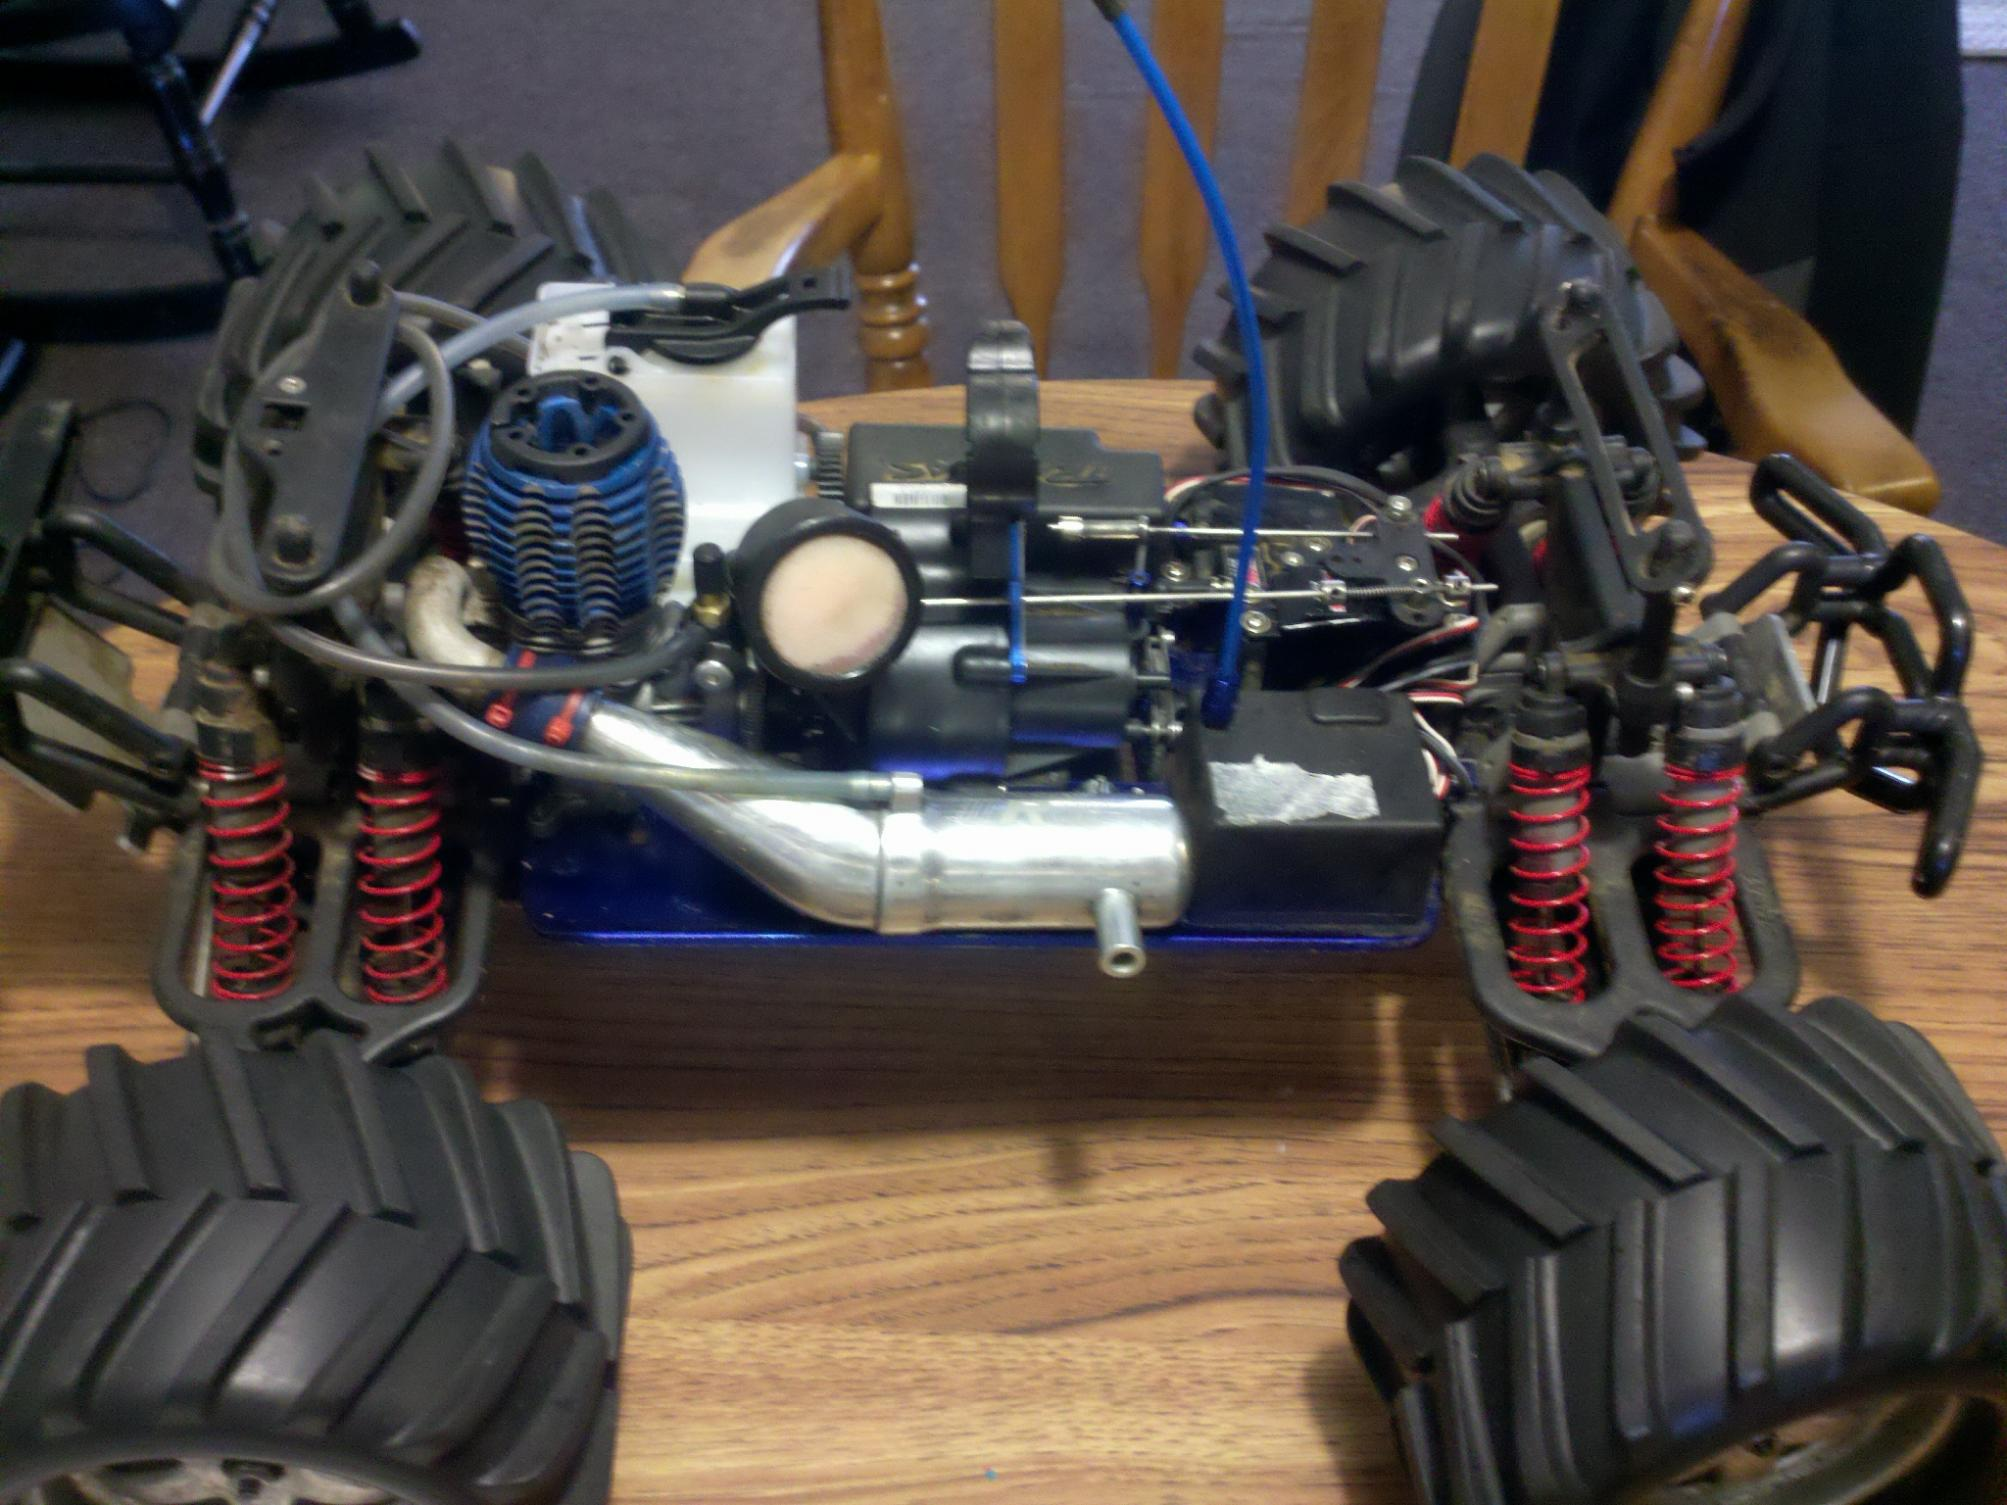 traxxas t maxx 2 5 transmission diagram tecumseh 6 hp carburetor get free image about